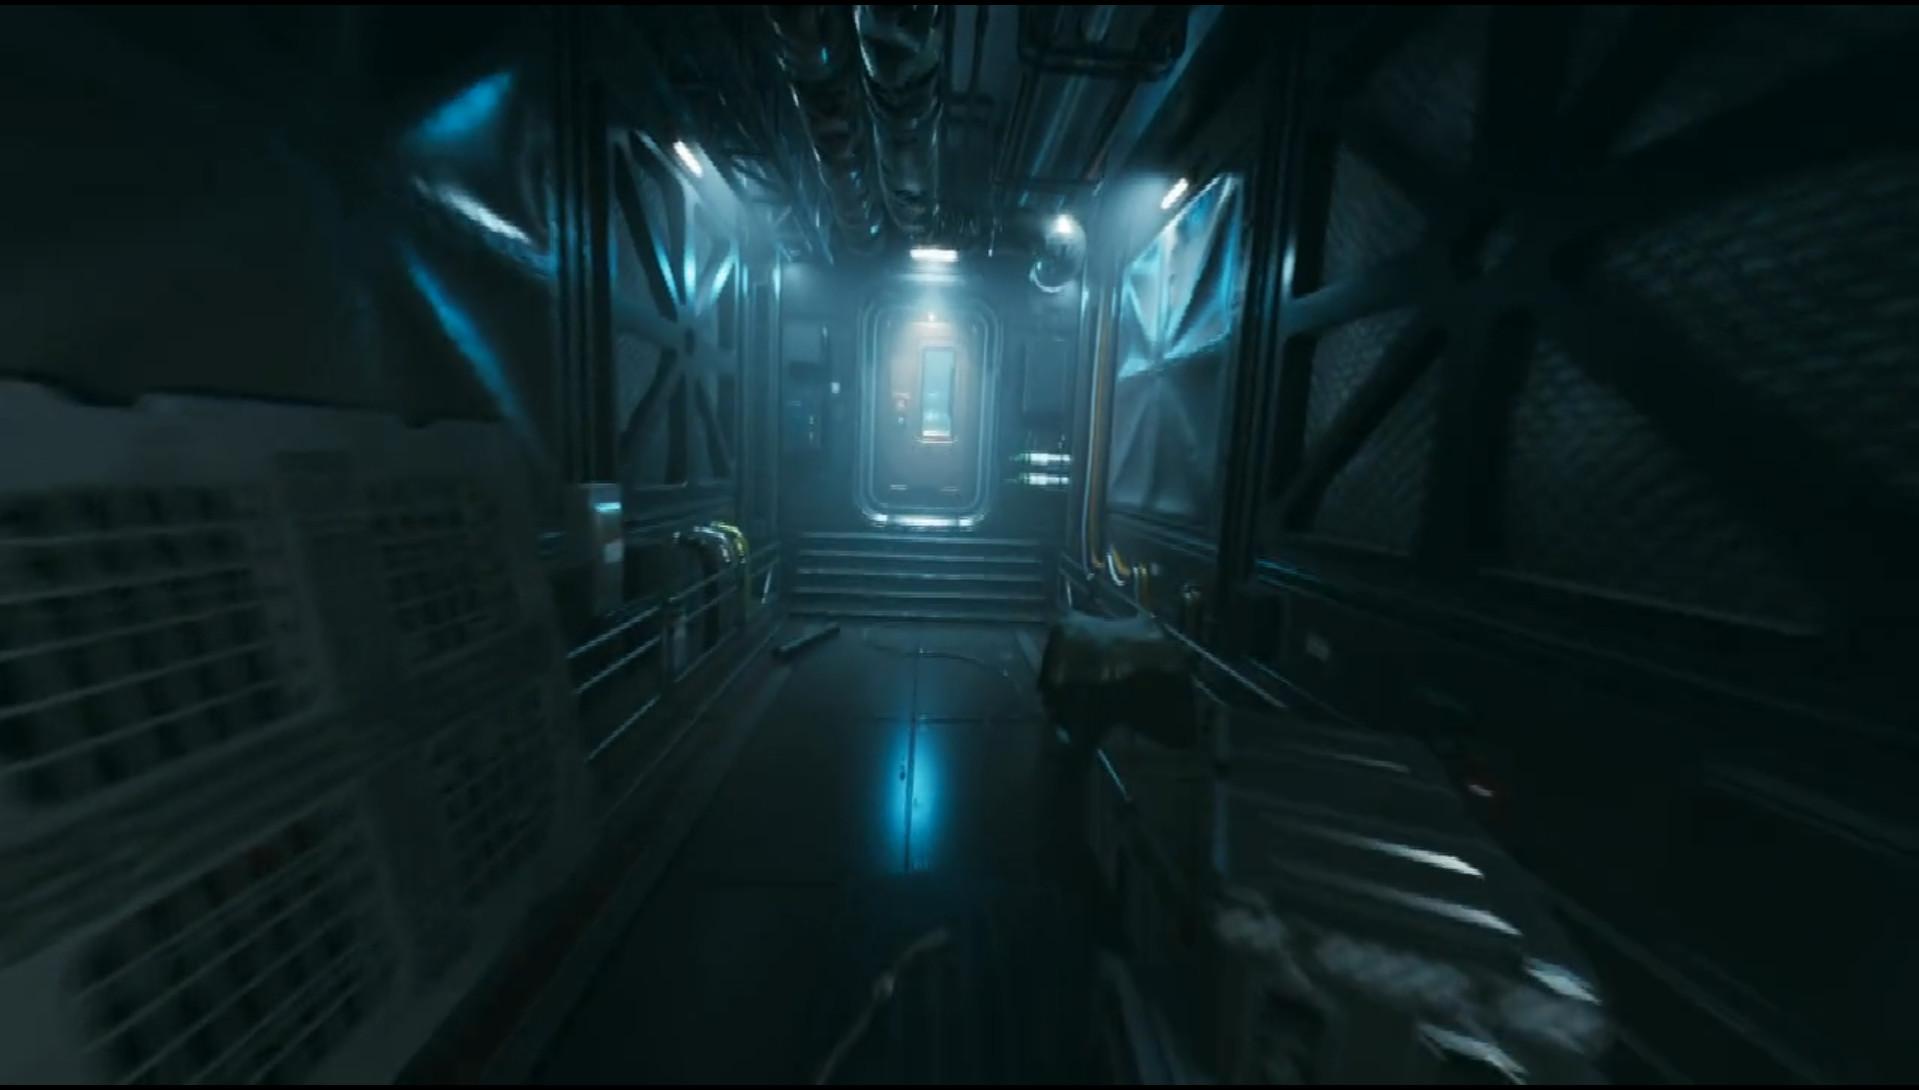 Awaken Realms анонсировала видеоигру Nemesis: Distress —адаптацию настолки «Немезида» 3